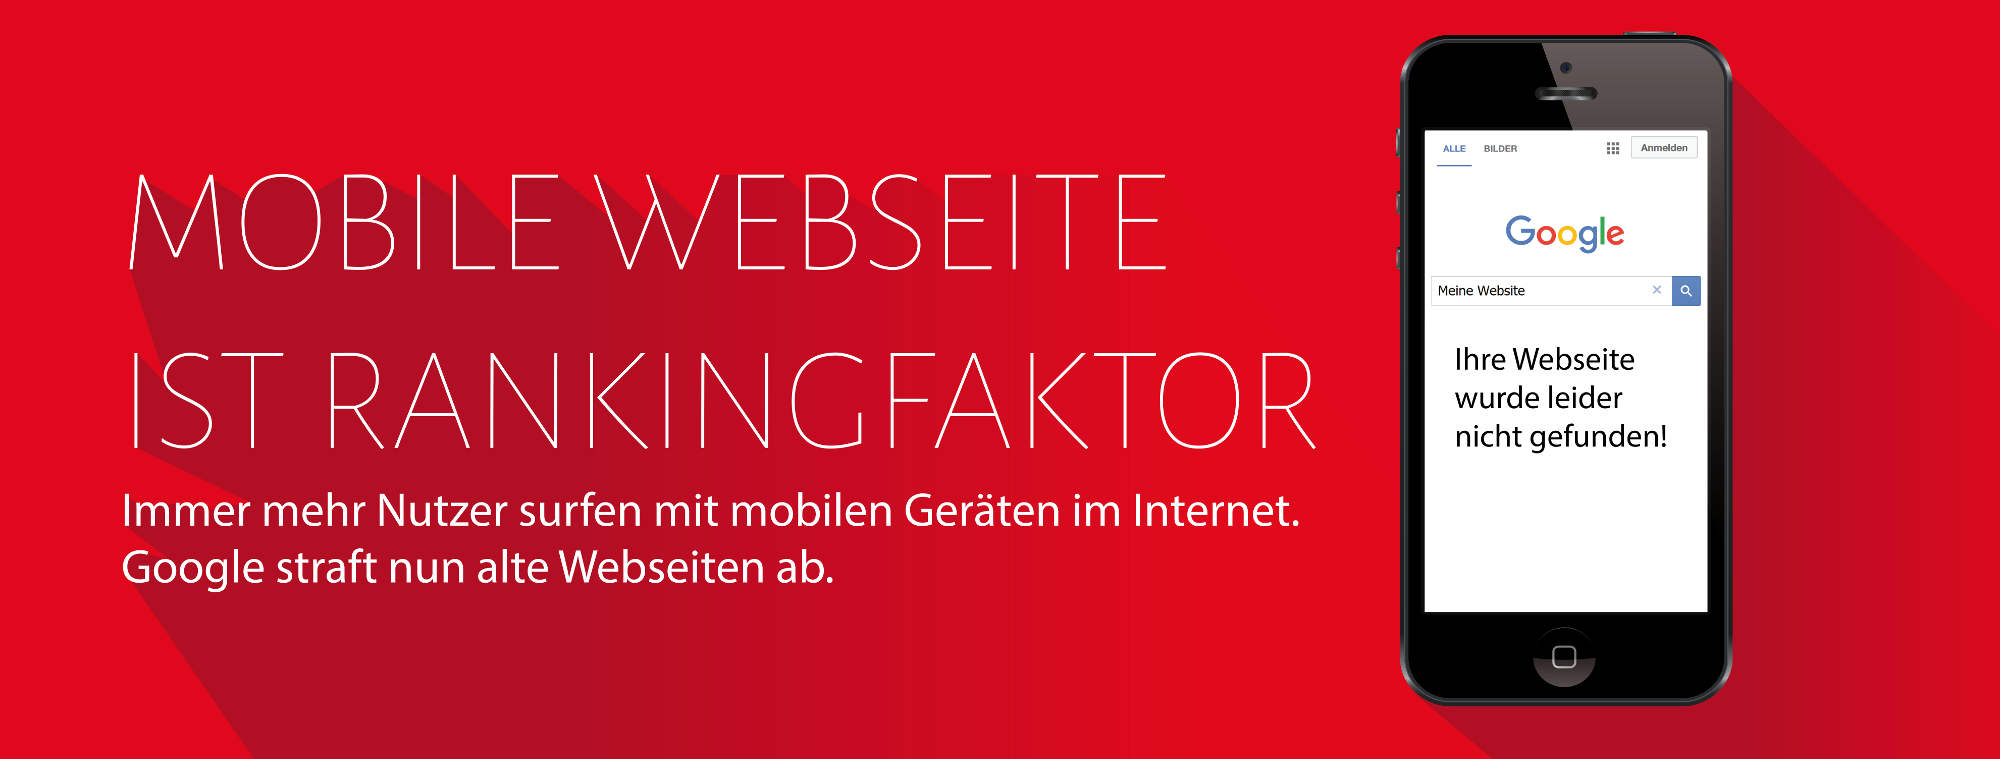 Mobile Webseite ist Rankingfaktor